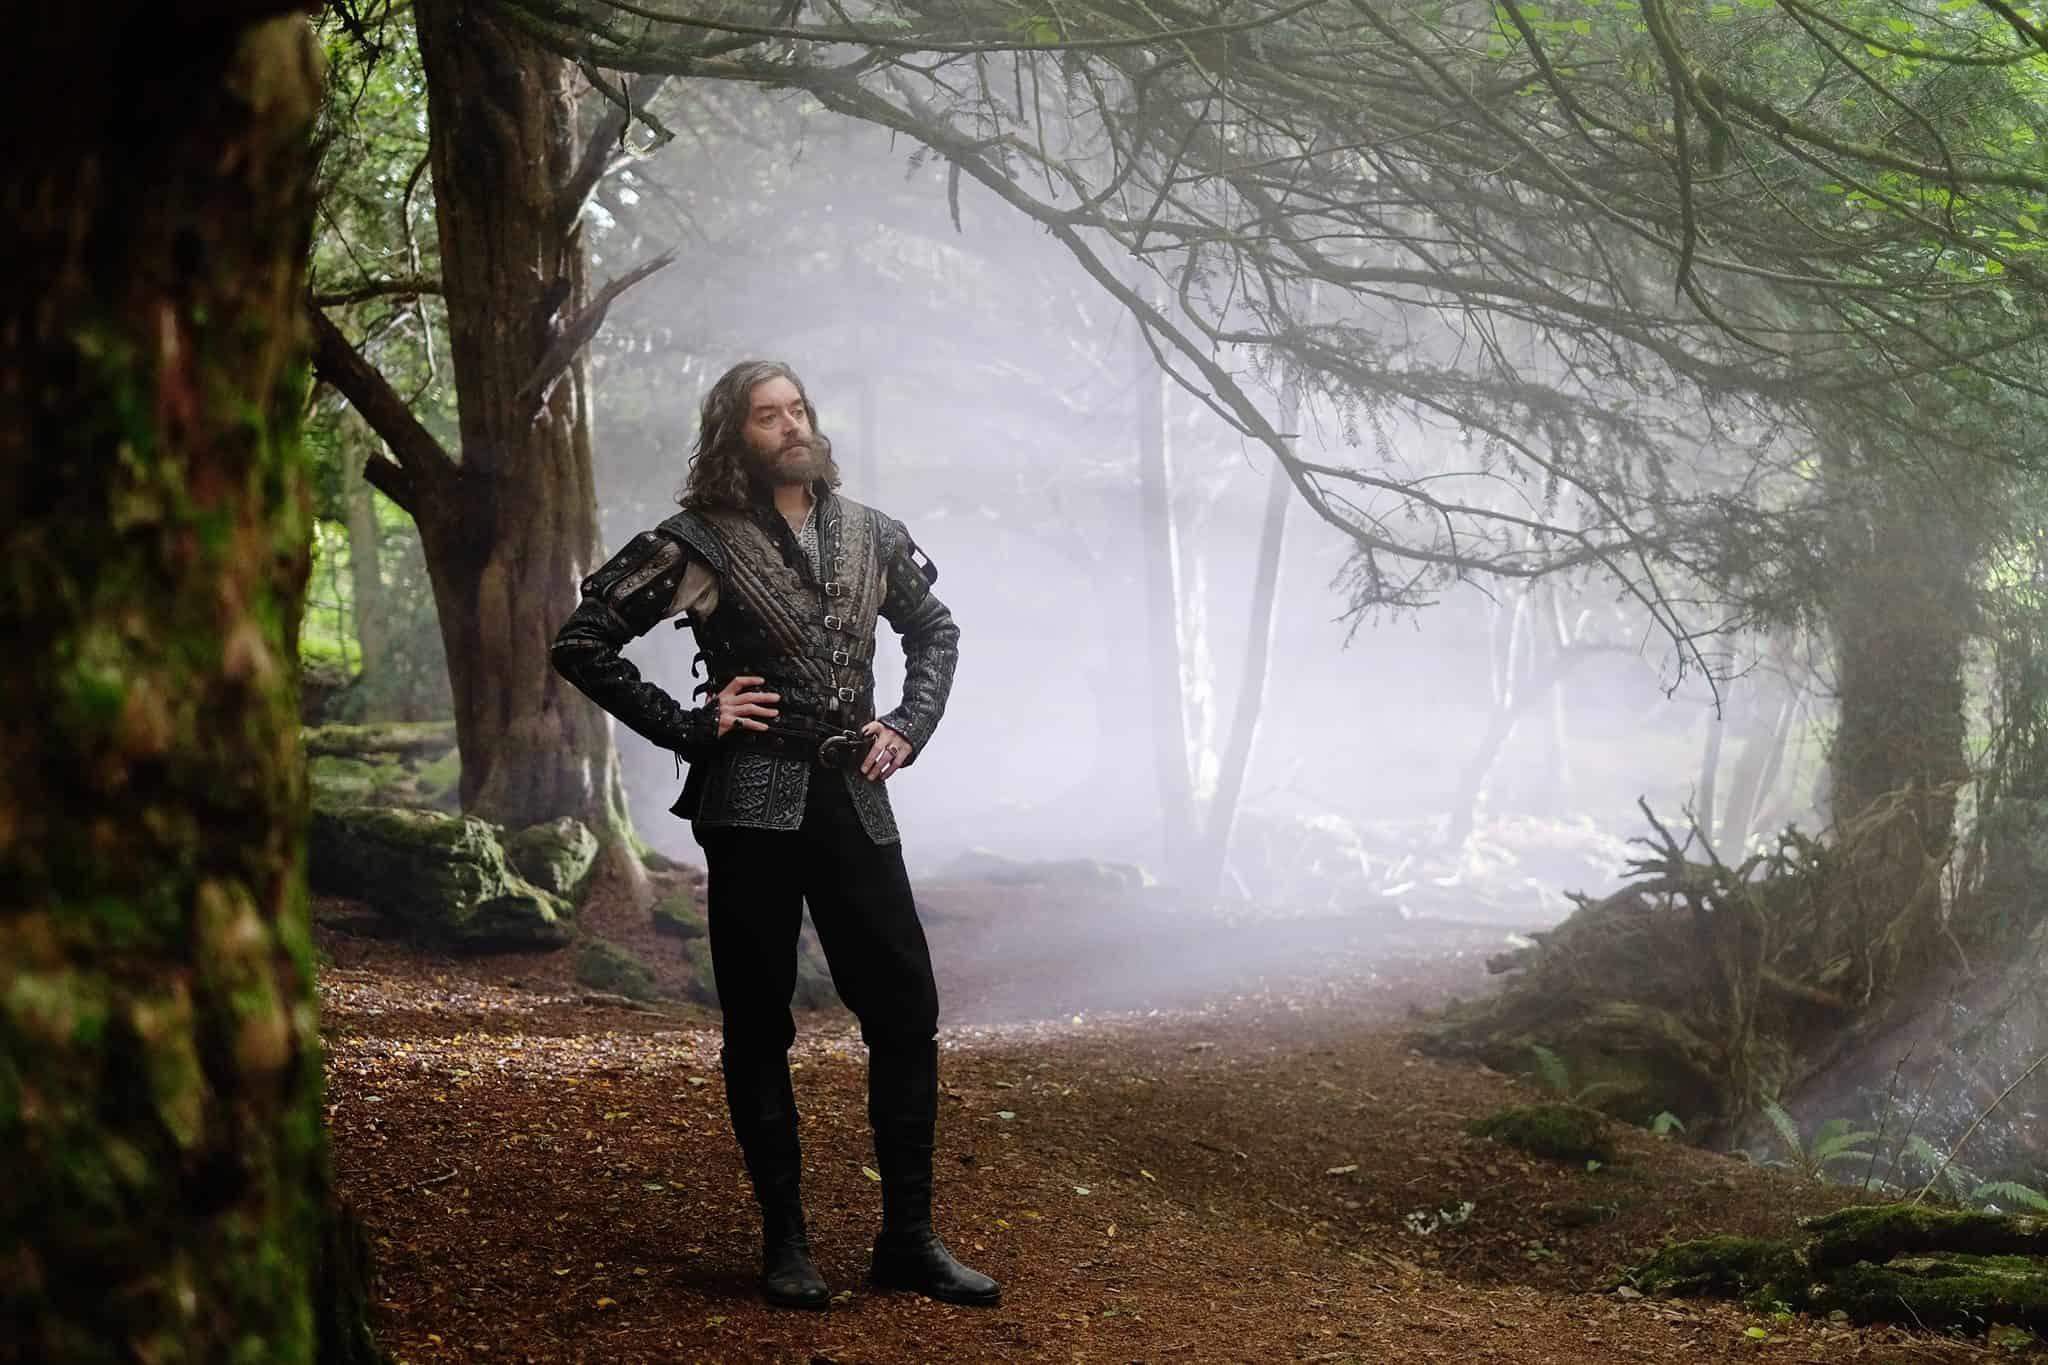 King Richard from Galavant Timothy Omundson